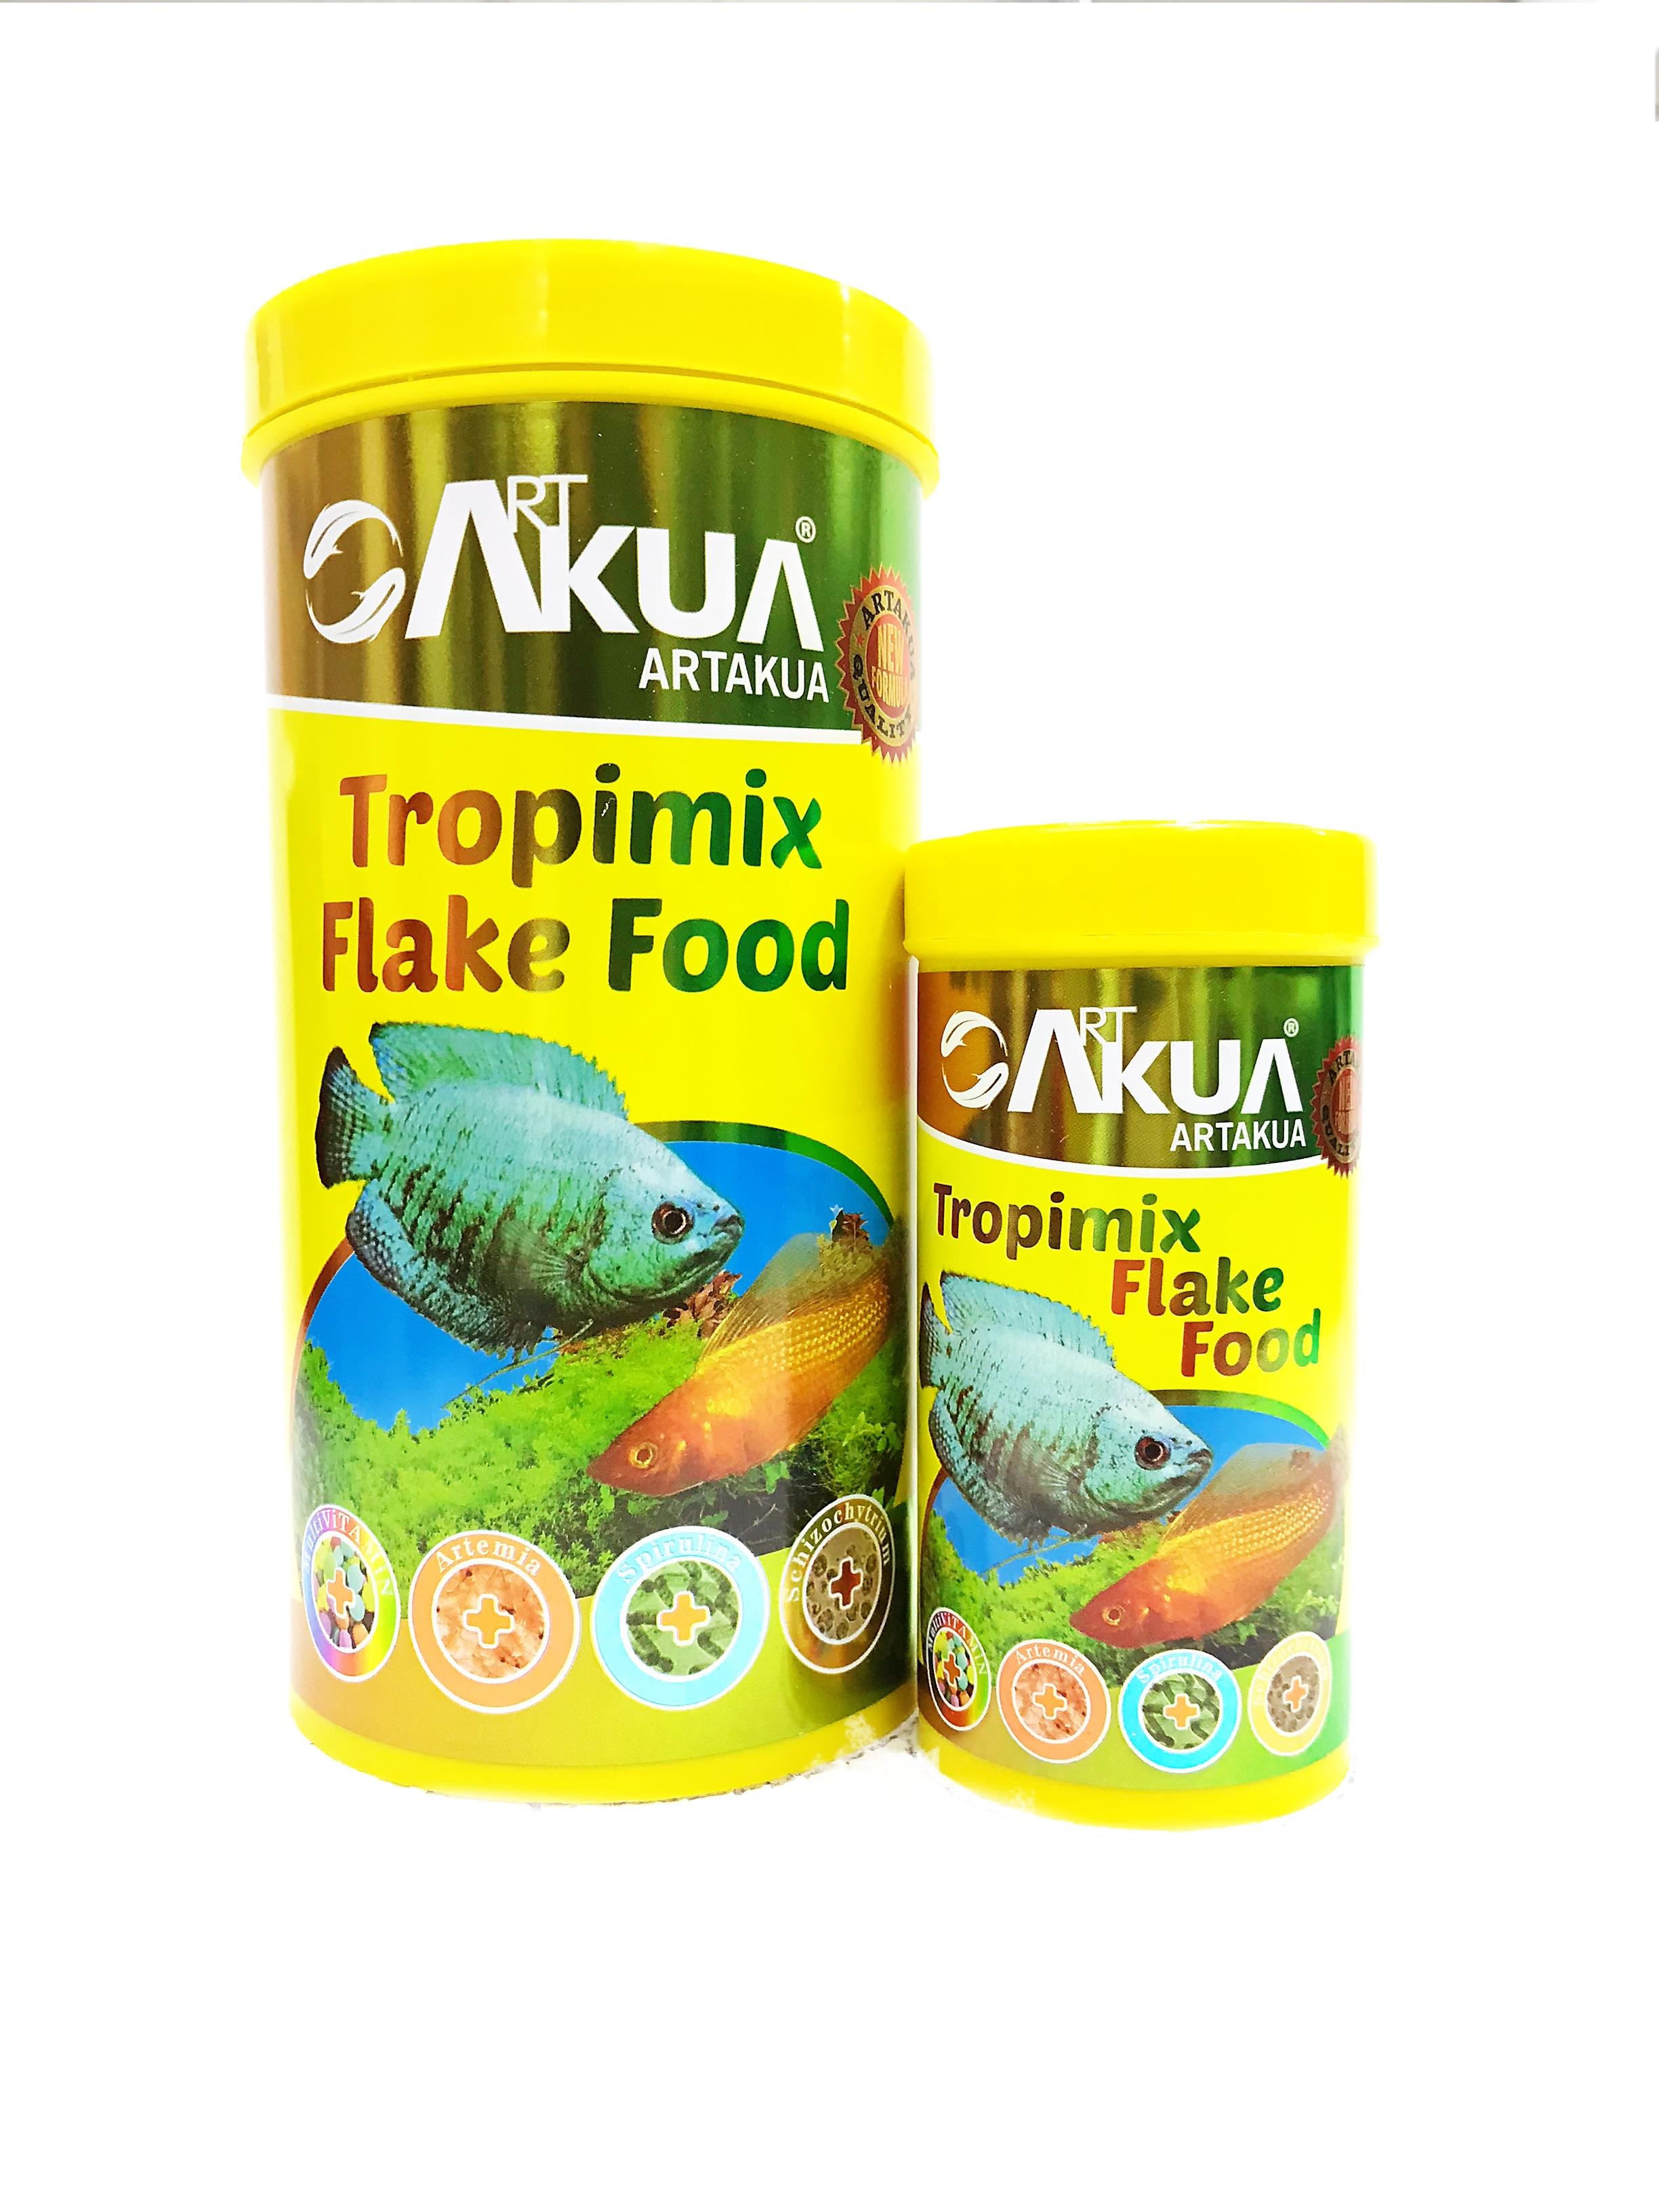 Artakua Tropimix Flake Food